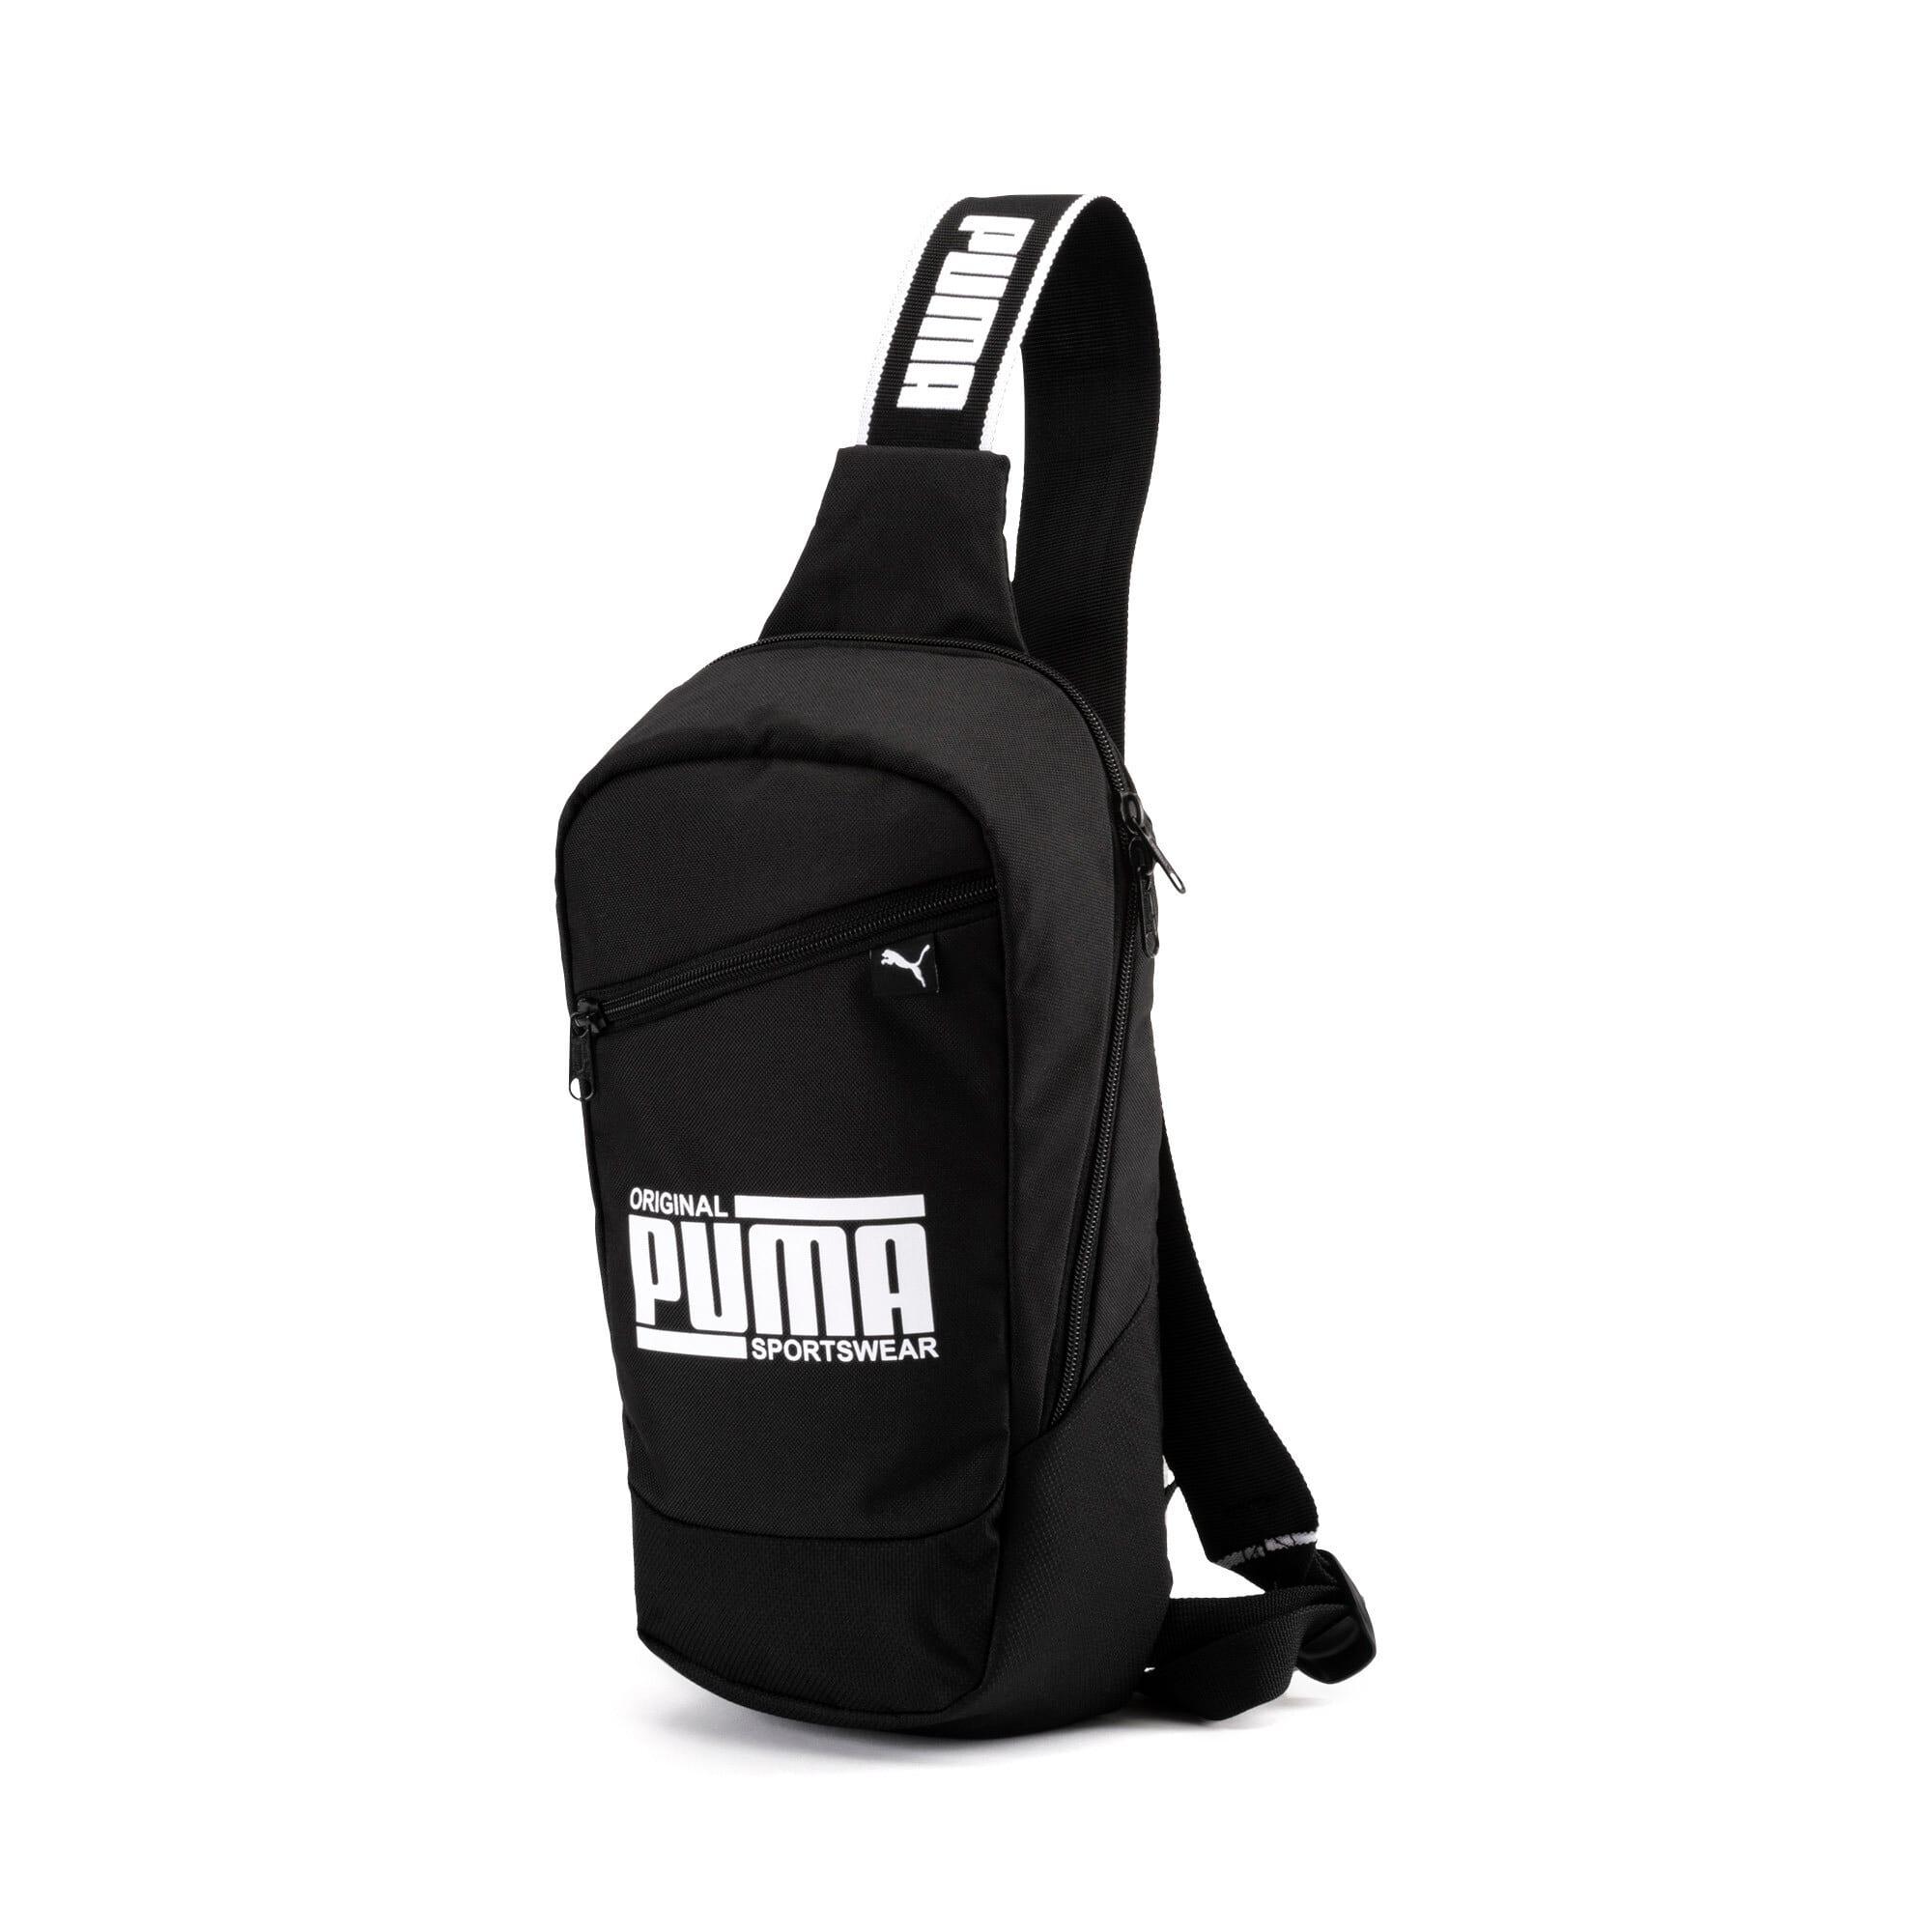 Thumbnail 1 of PUMA Sole Cross Body Bag, Puma Black, medium